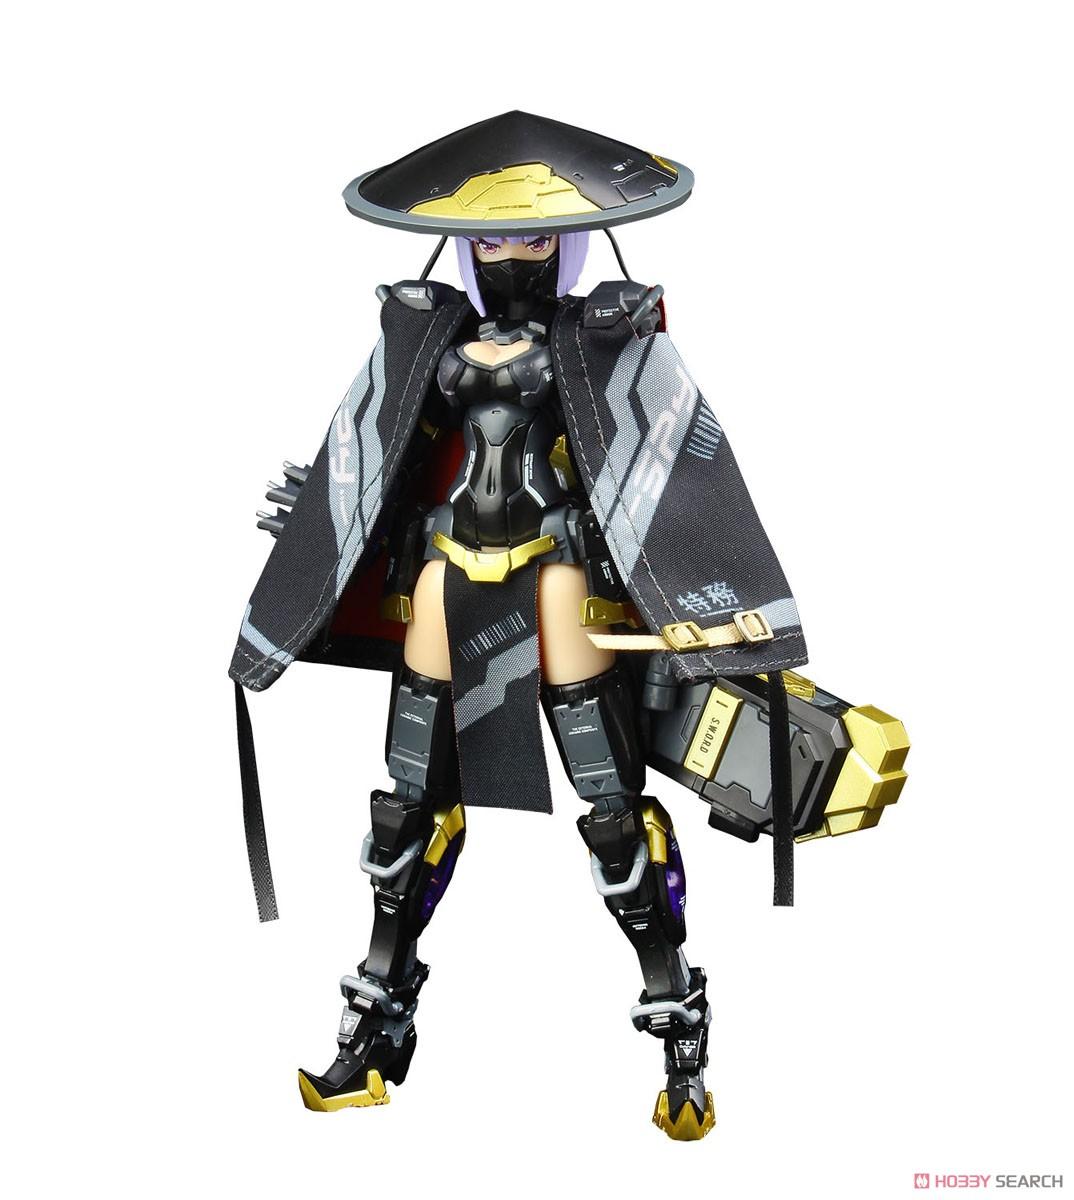 ATKガール『錦衣衛装甲少女 JW-059 ユニバーサルカラーVer.』1/12 プラモデル-001